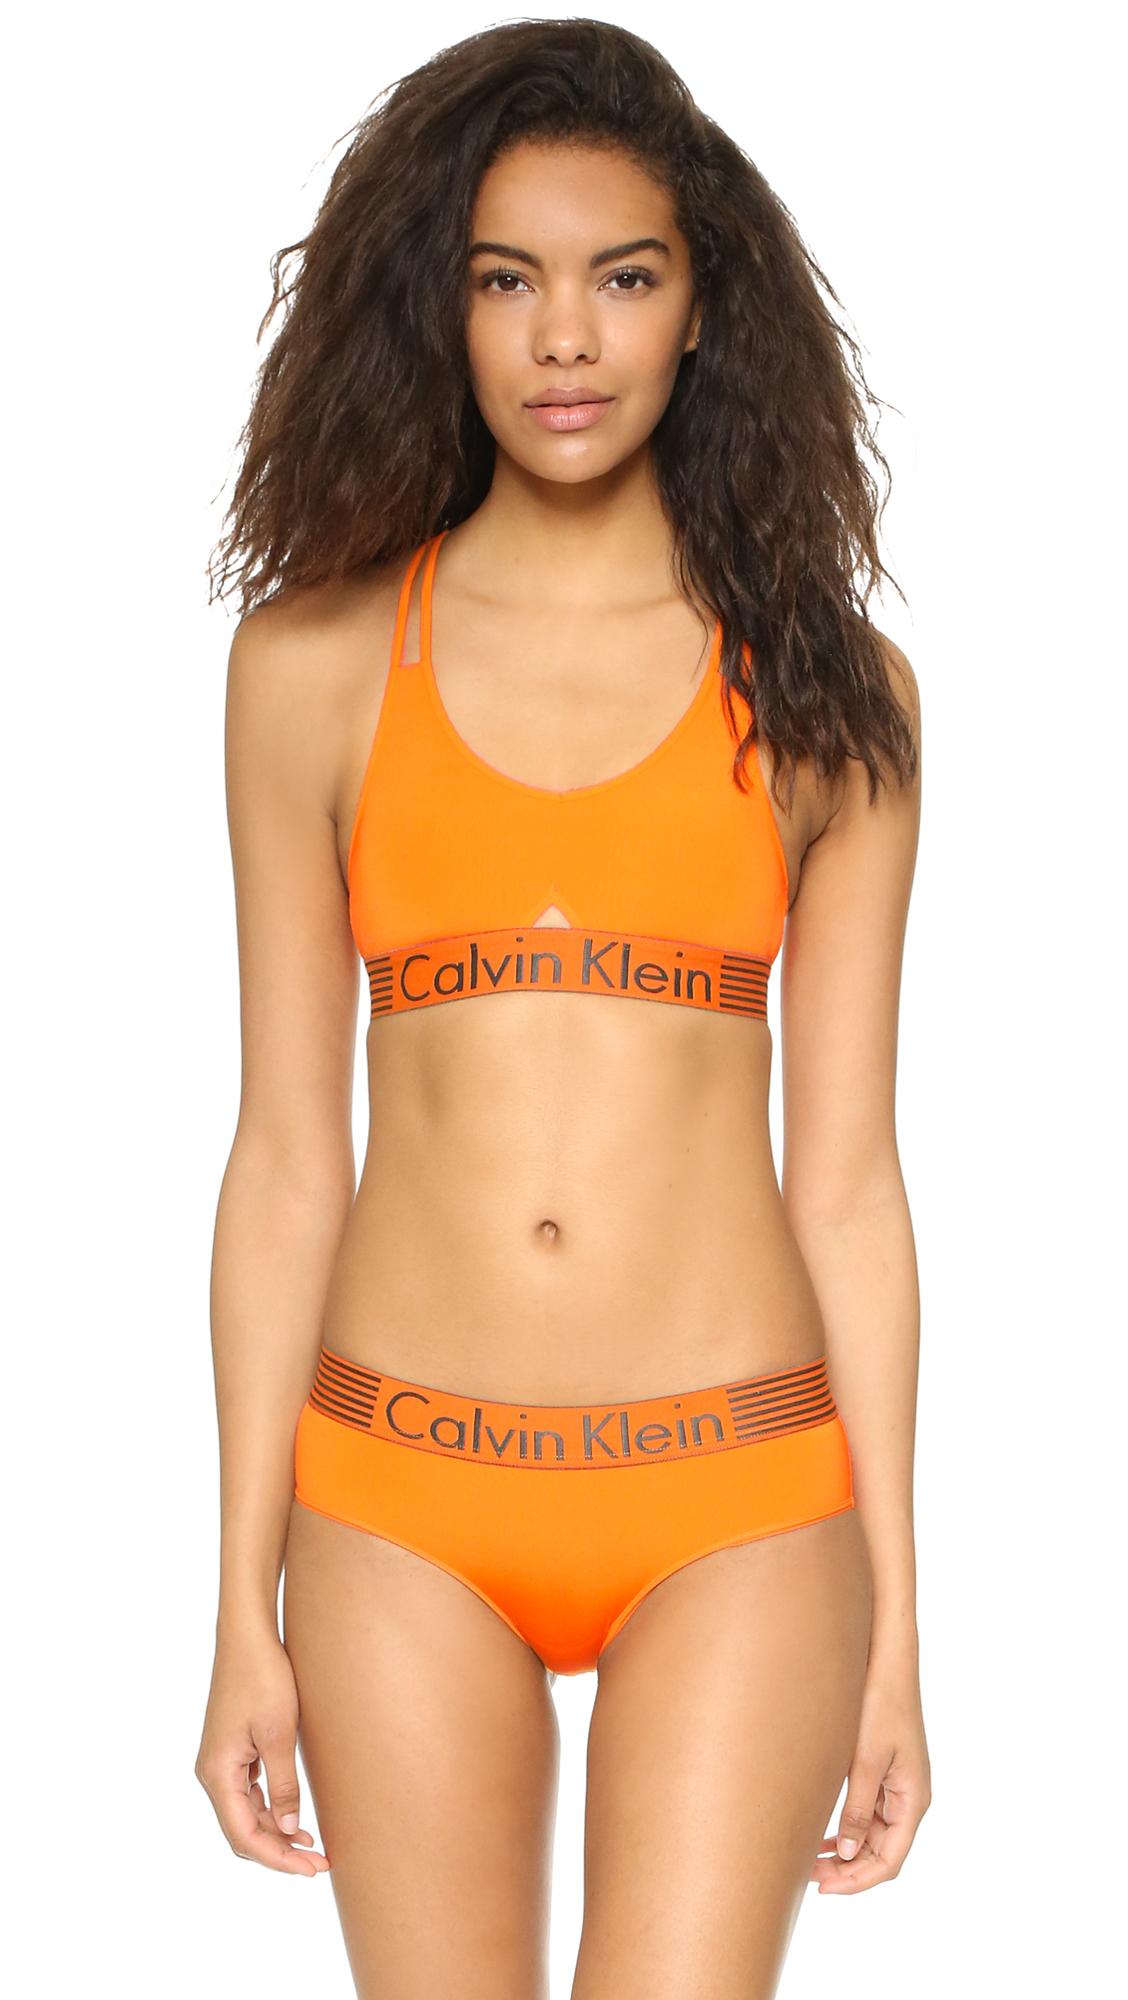 88dc88f7ebb Calvin Klein Iron Strength Micro Bralette in Orange - Lyst